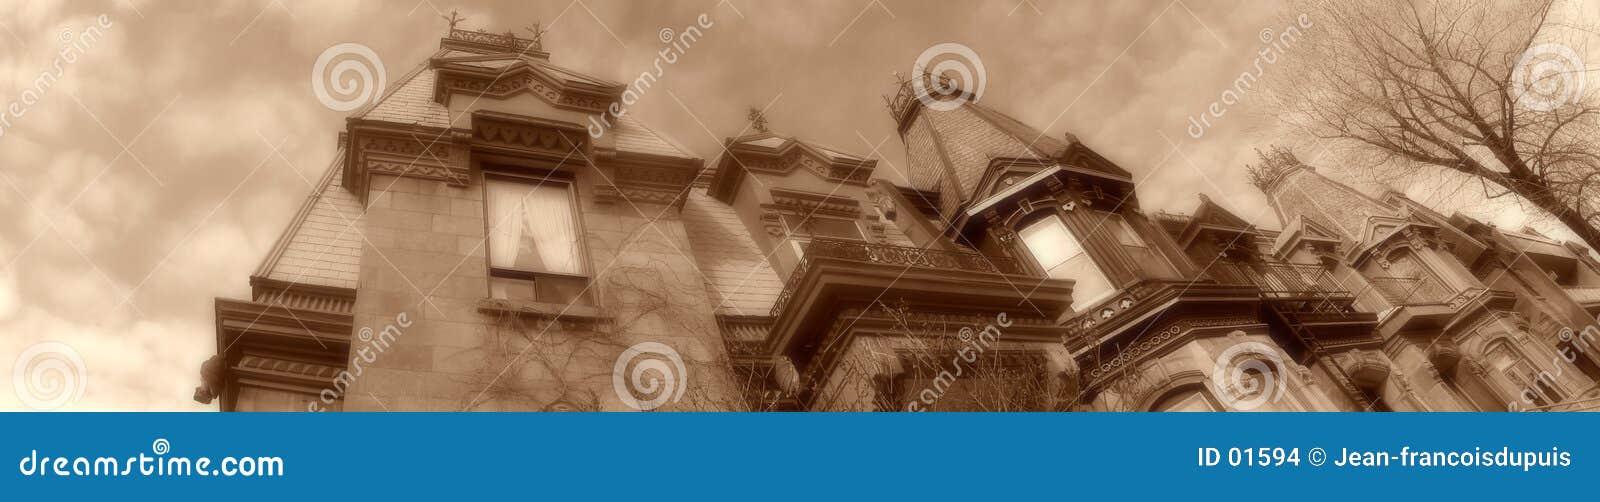 Houses montreal